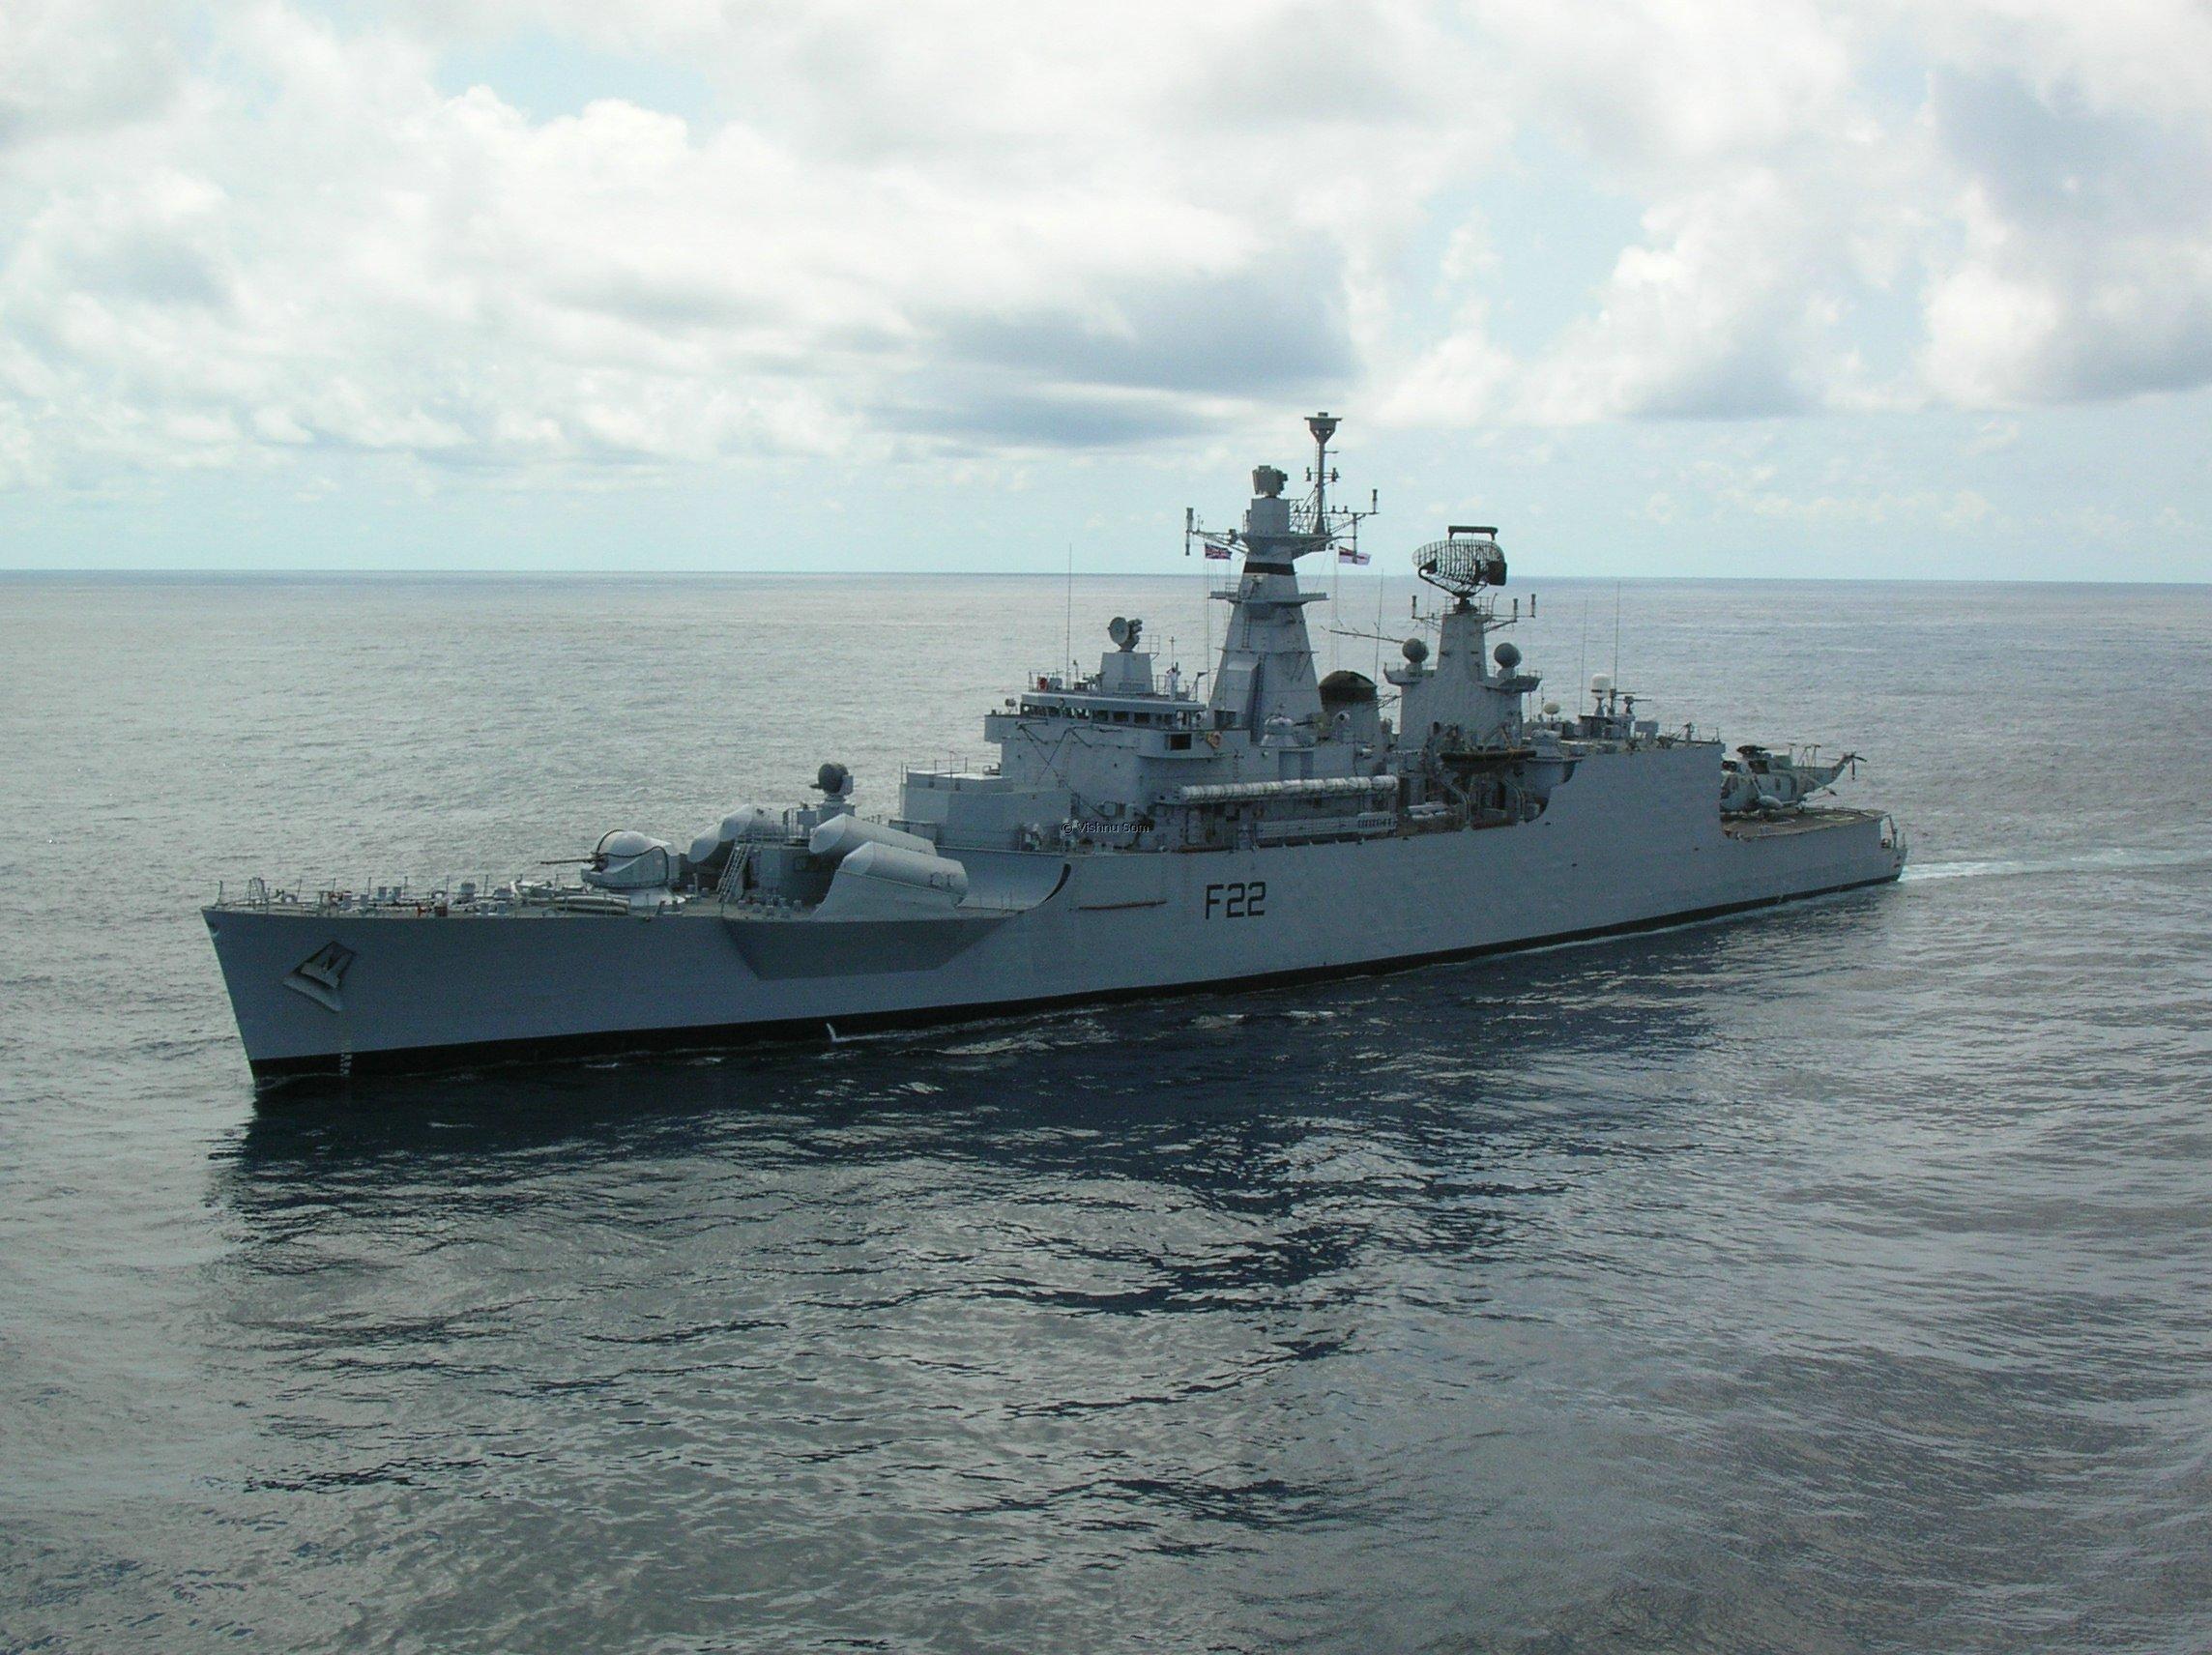 ins ganga f22 godavari class frigate india